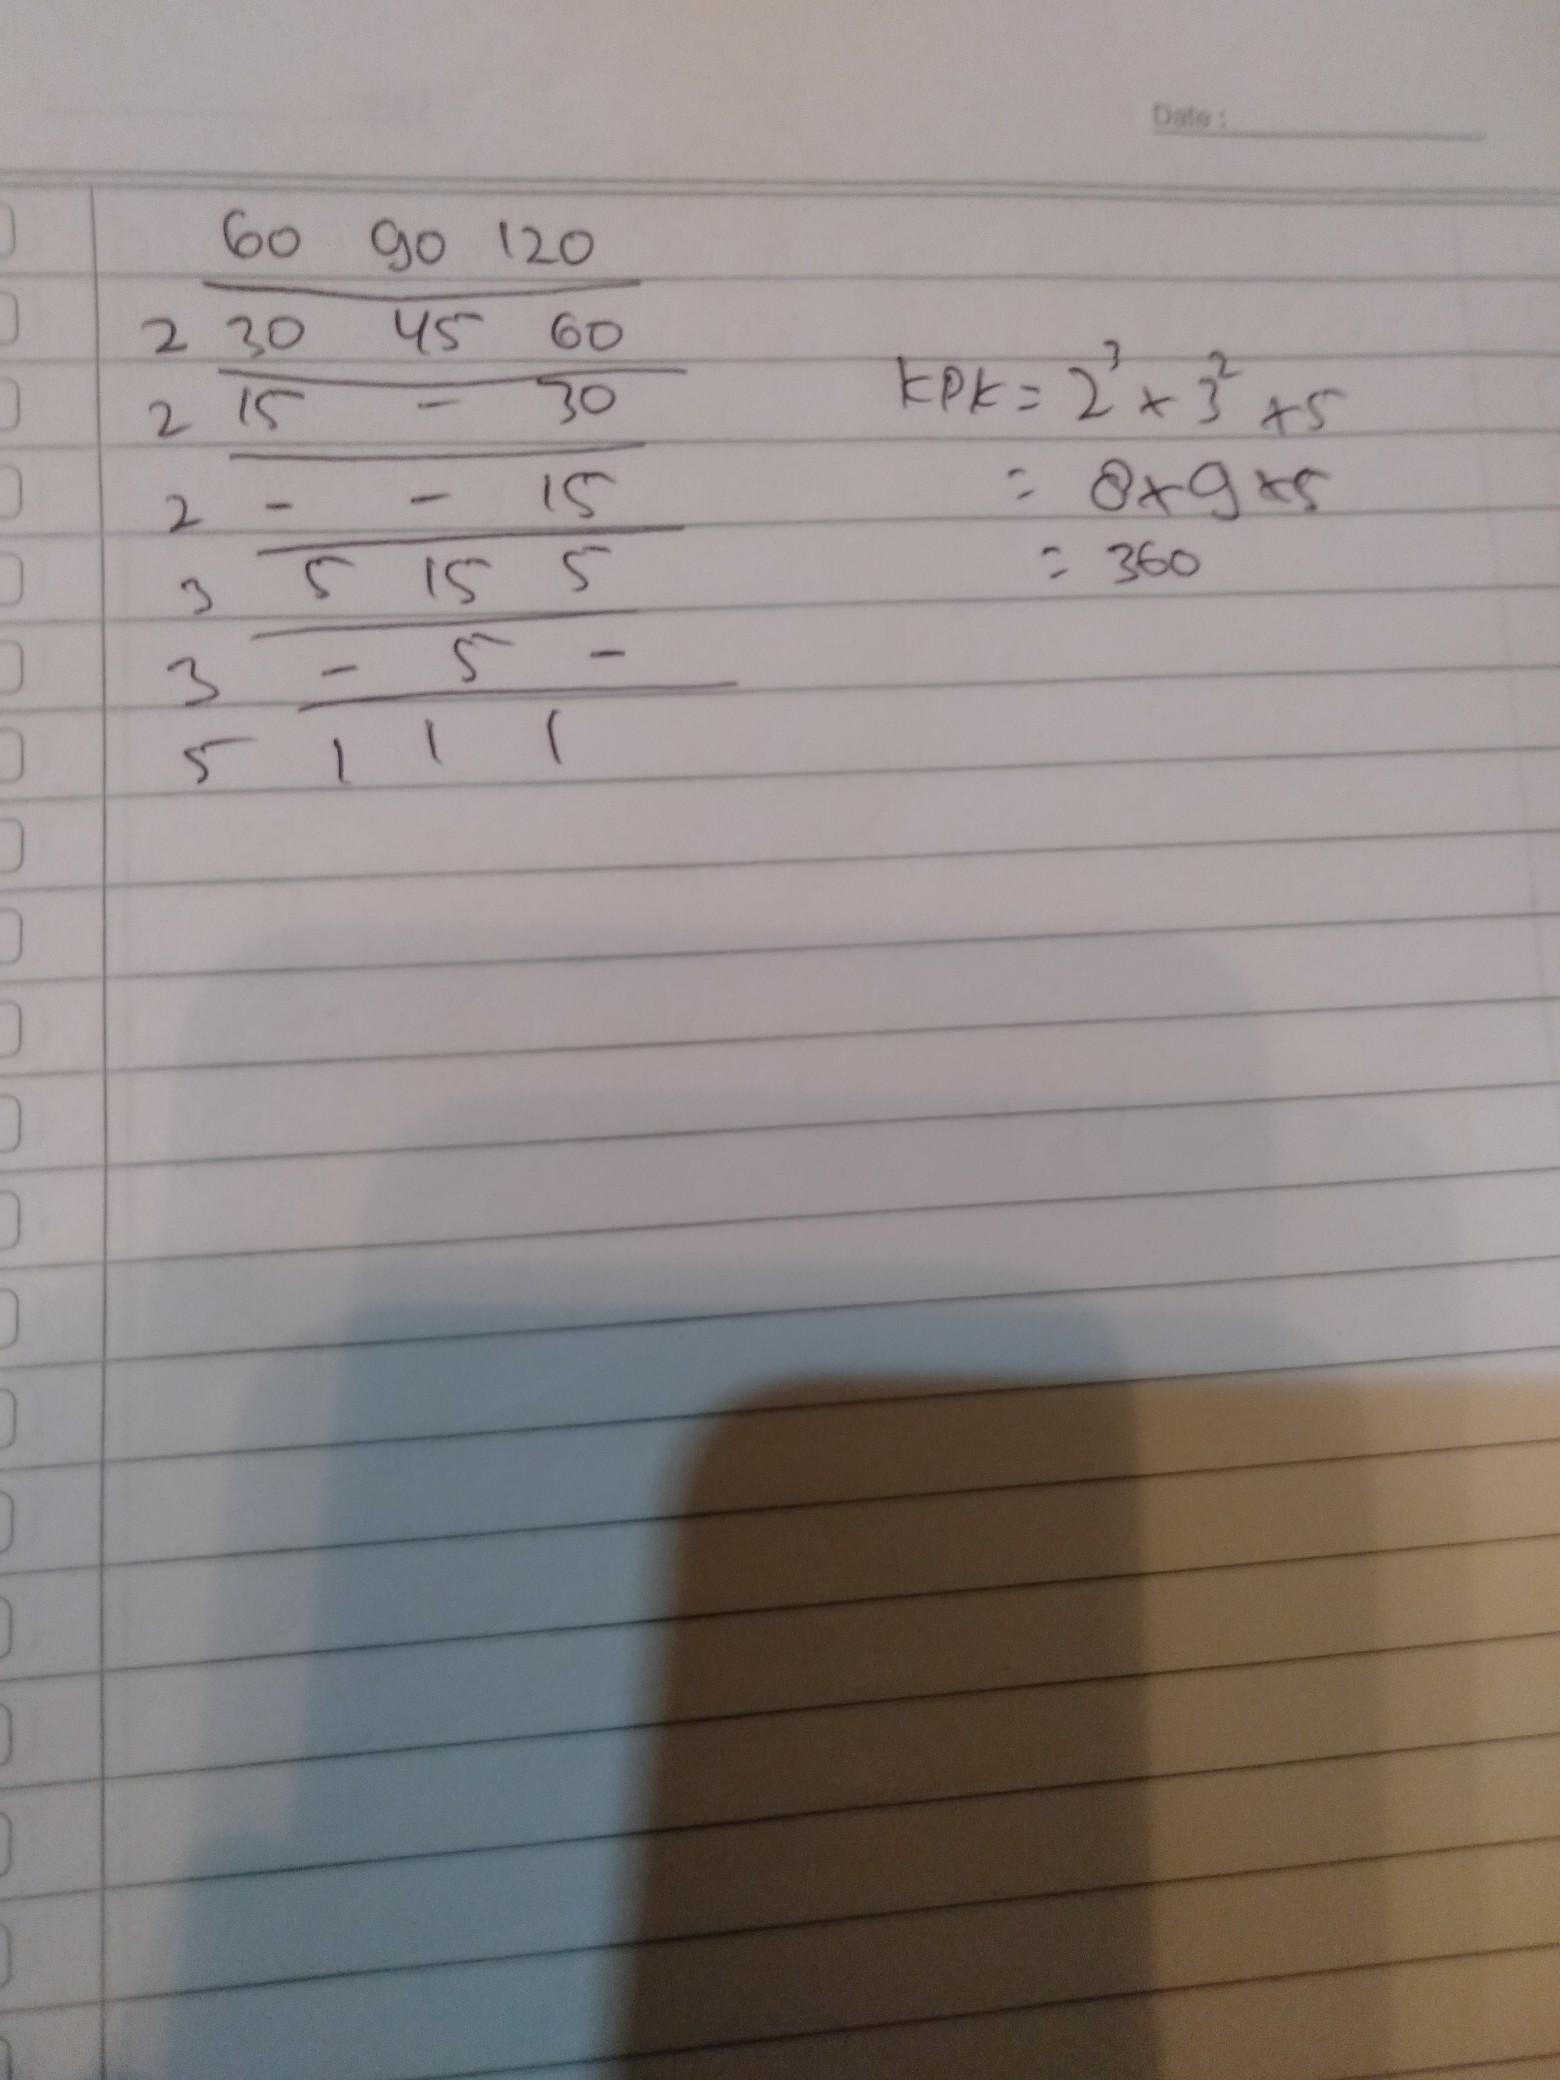 Faktorisasi Prima Dari 60 : faktorisasi, prima, Faktorisasi, Prima, 60,90,dan120, Brainly.co.id